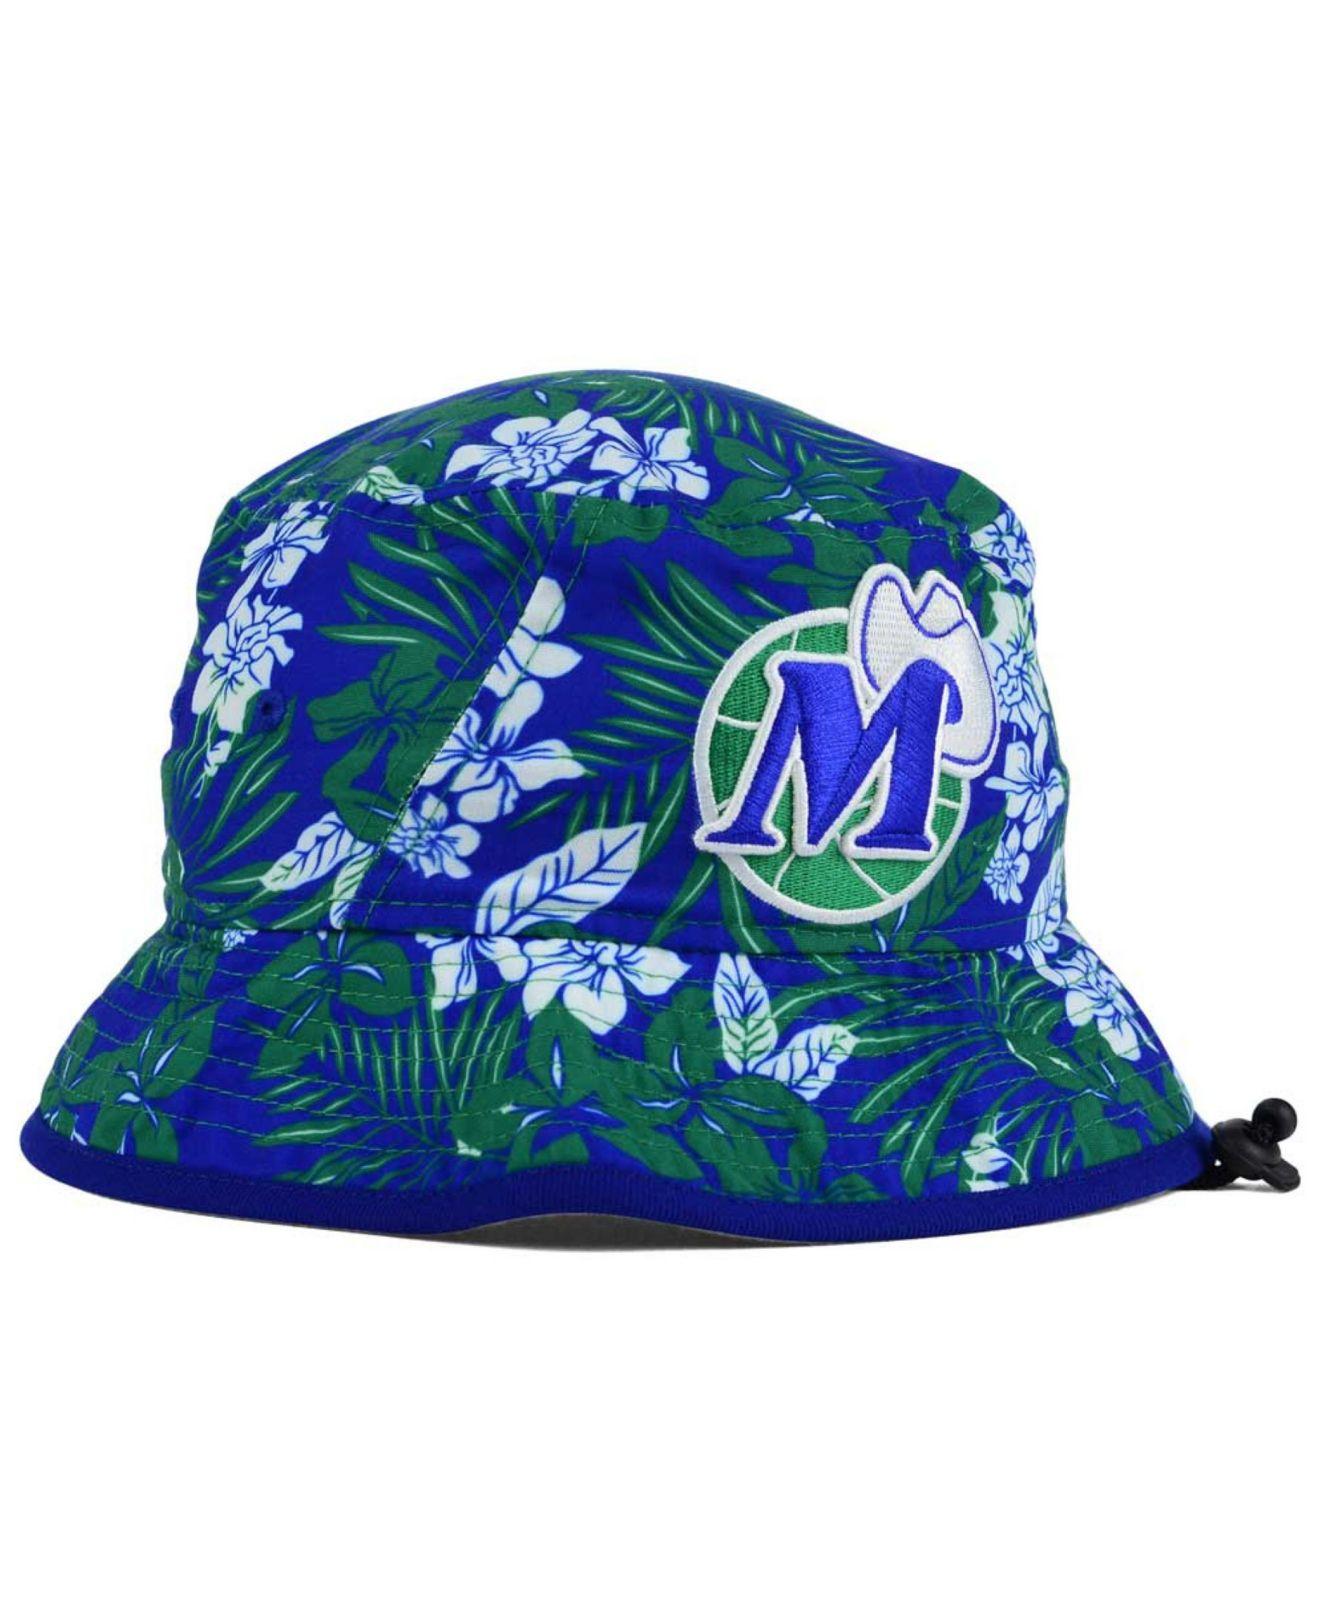 more photos 3a7c8 b29fa KTZ Dallas Mavericks Wowie Bucket Hat in Blue for Men - Lyst